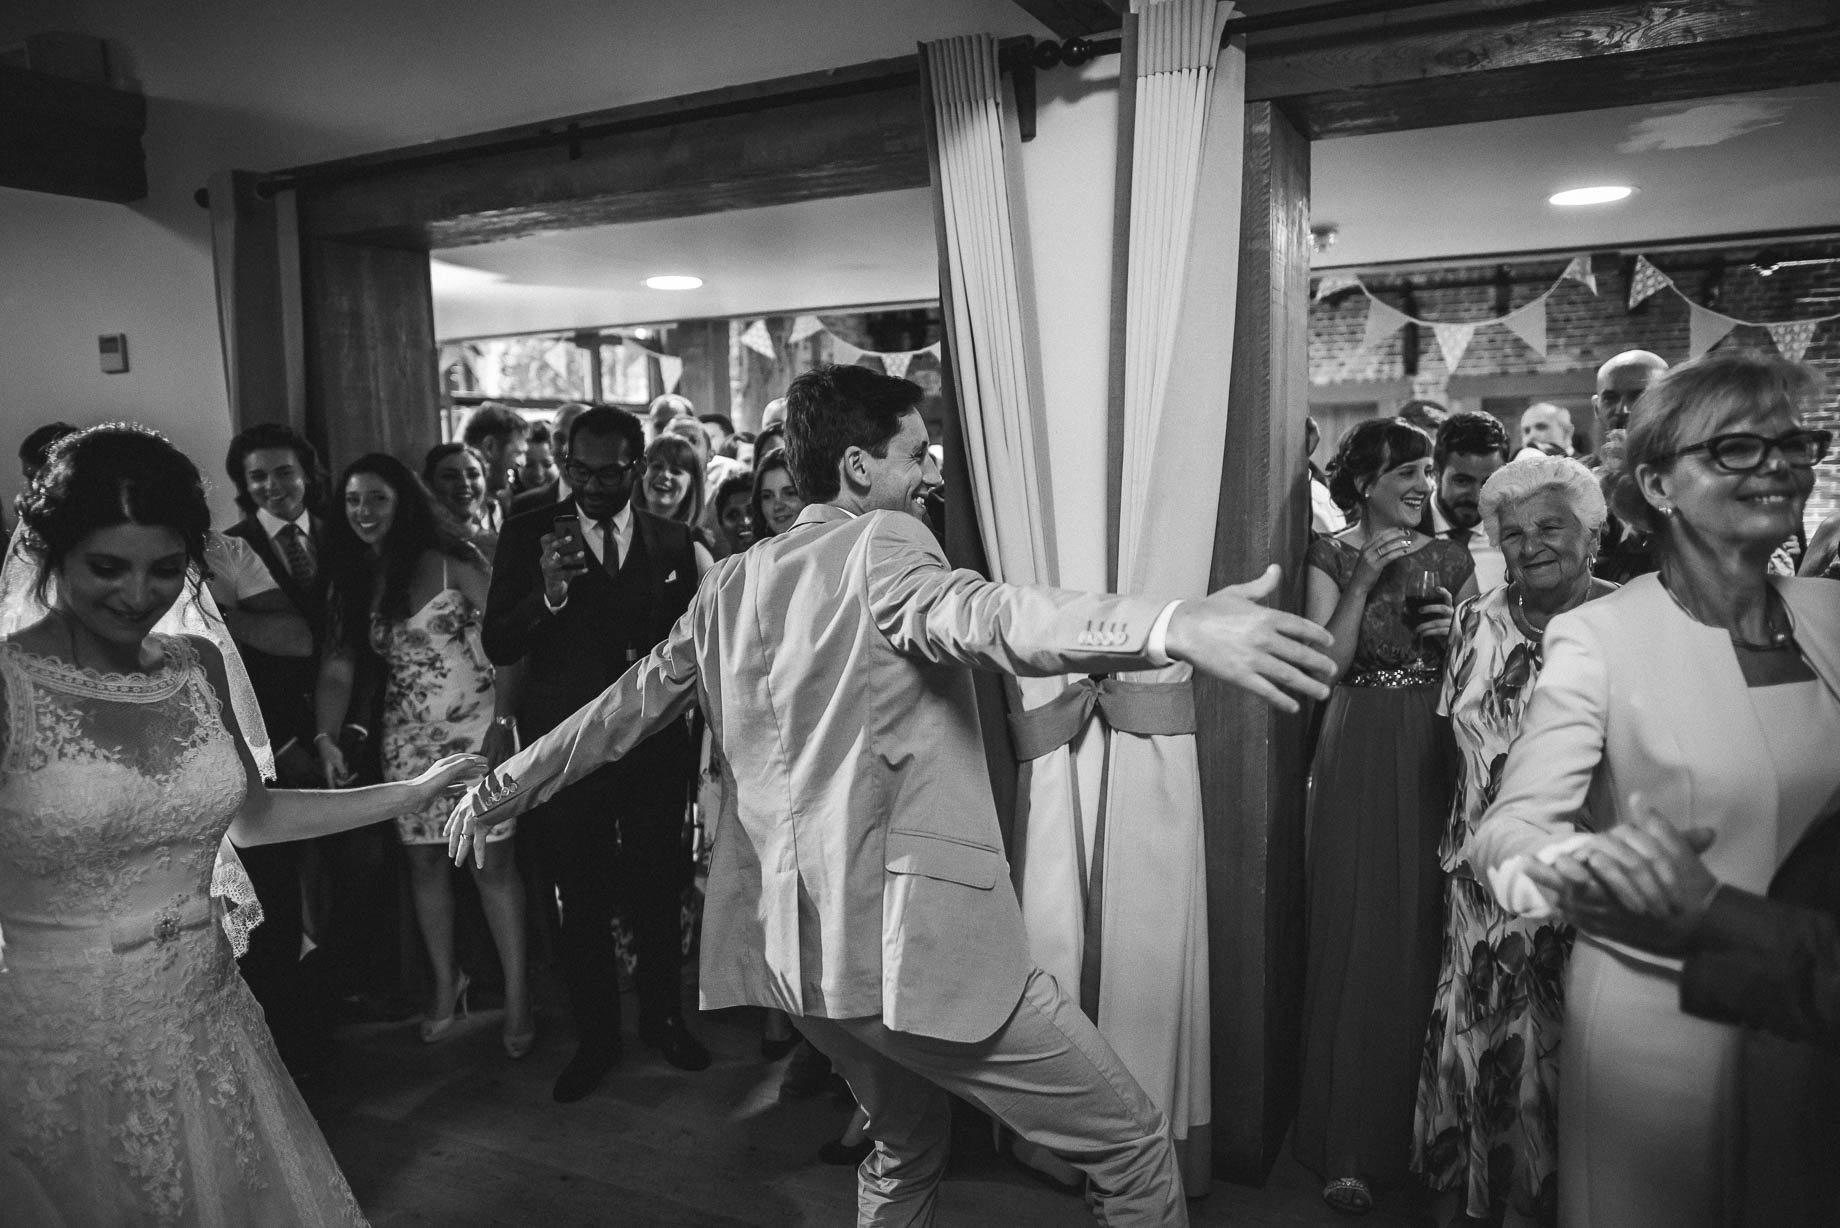 Gaynes Park wedding photography - Guy Collier Photography - Rachel and Jon (162 of 169)